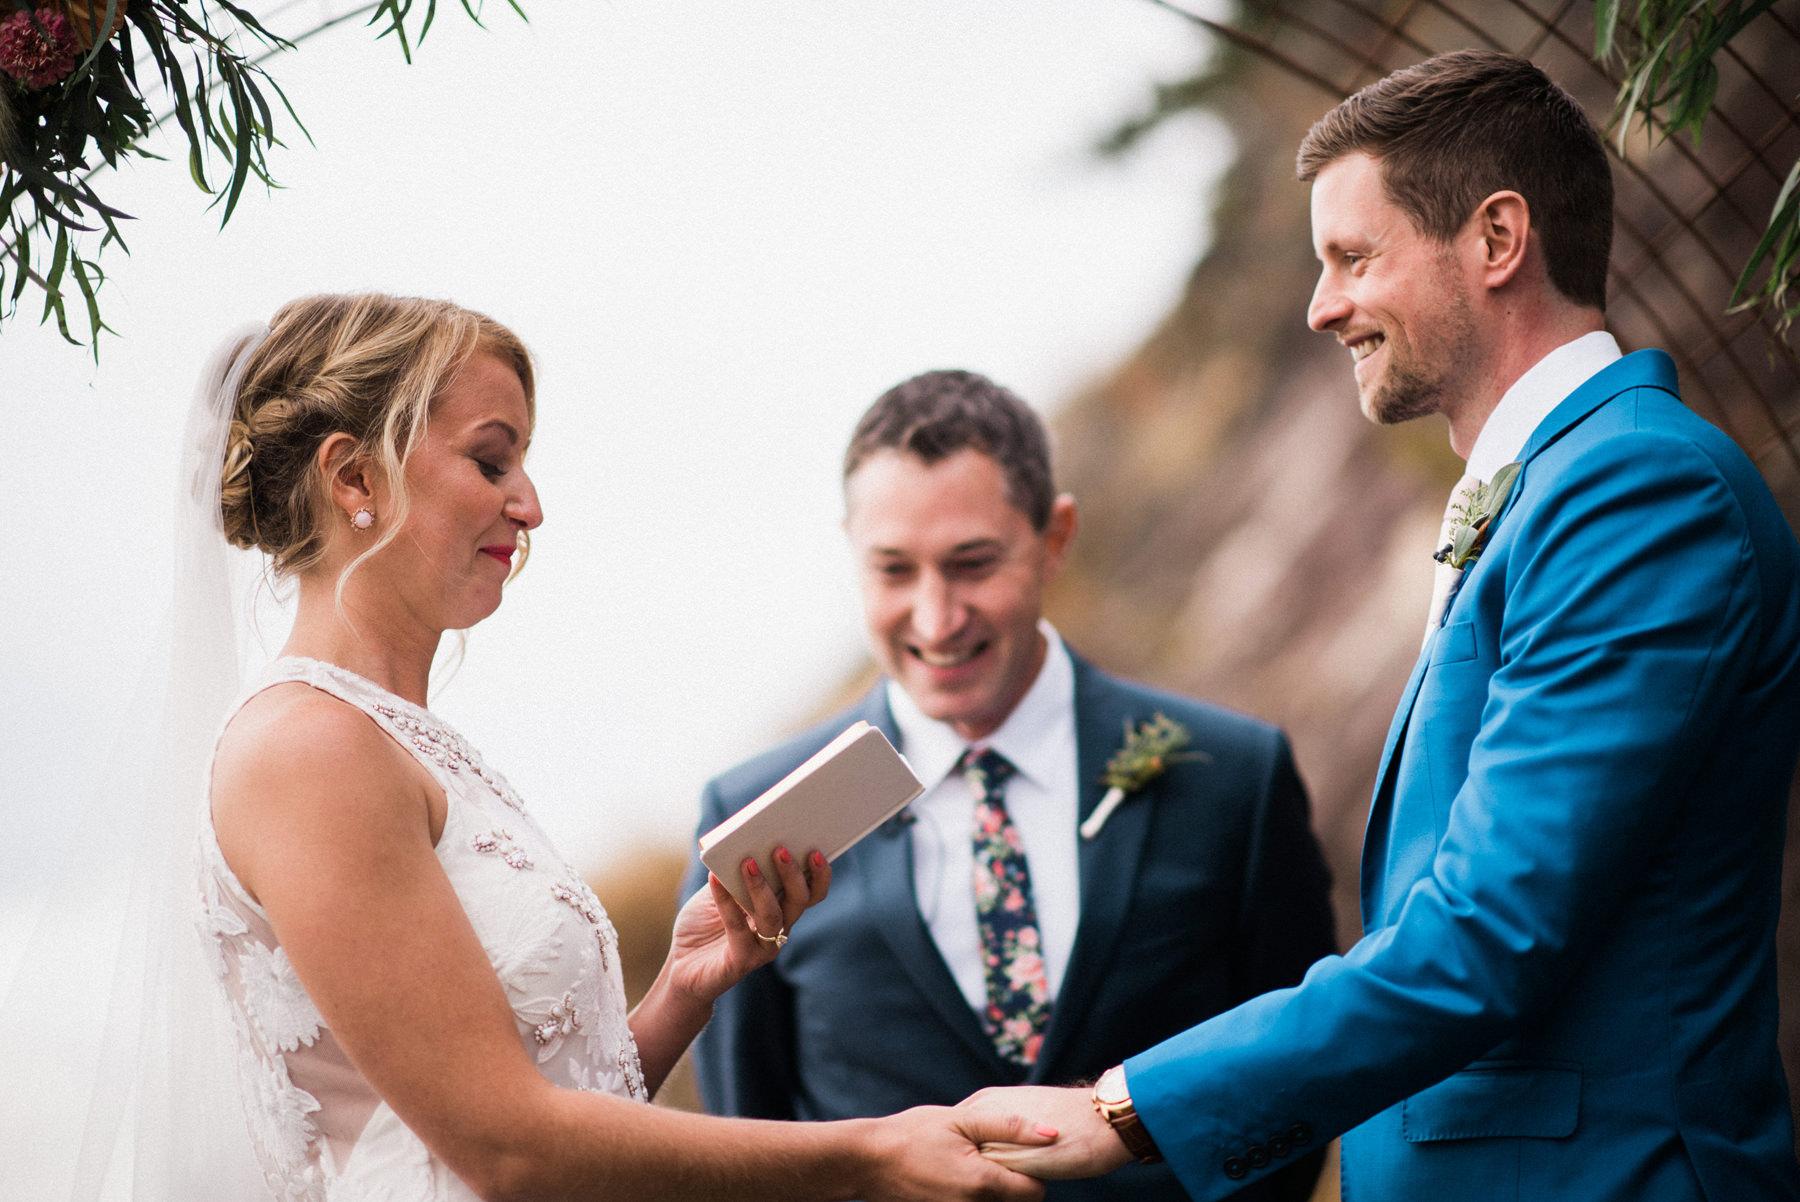 327-colorful-outdoor-lopez-island-wedding.jpg